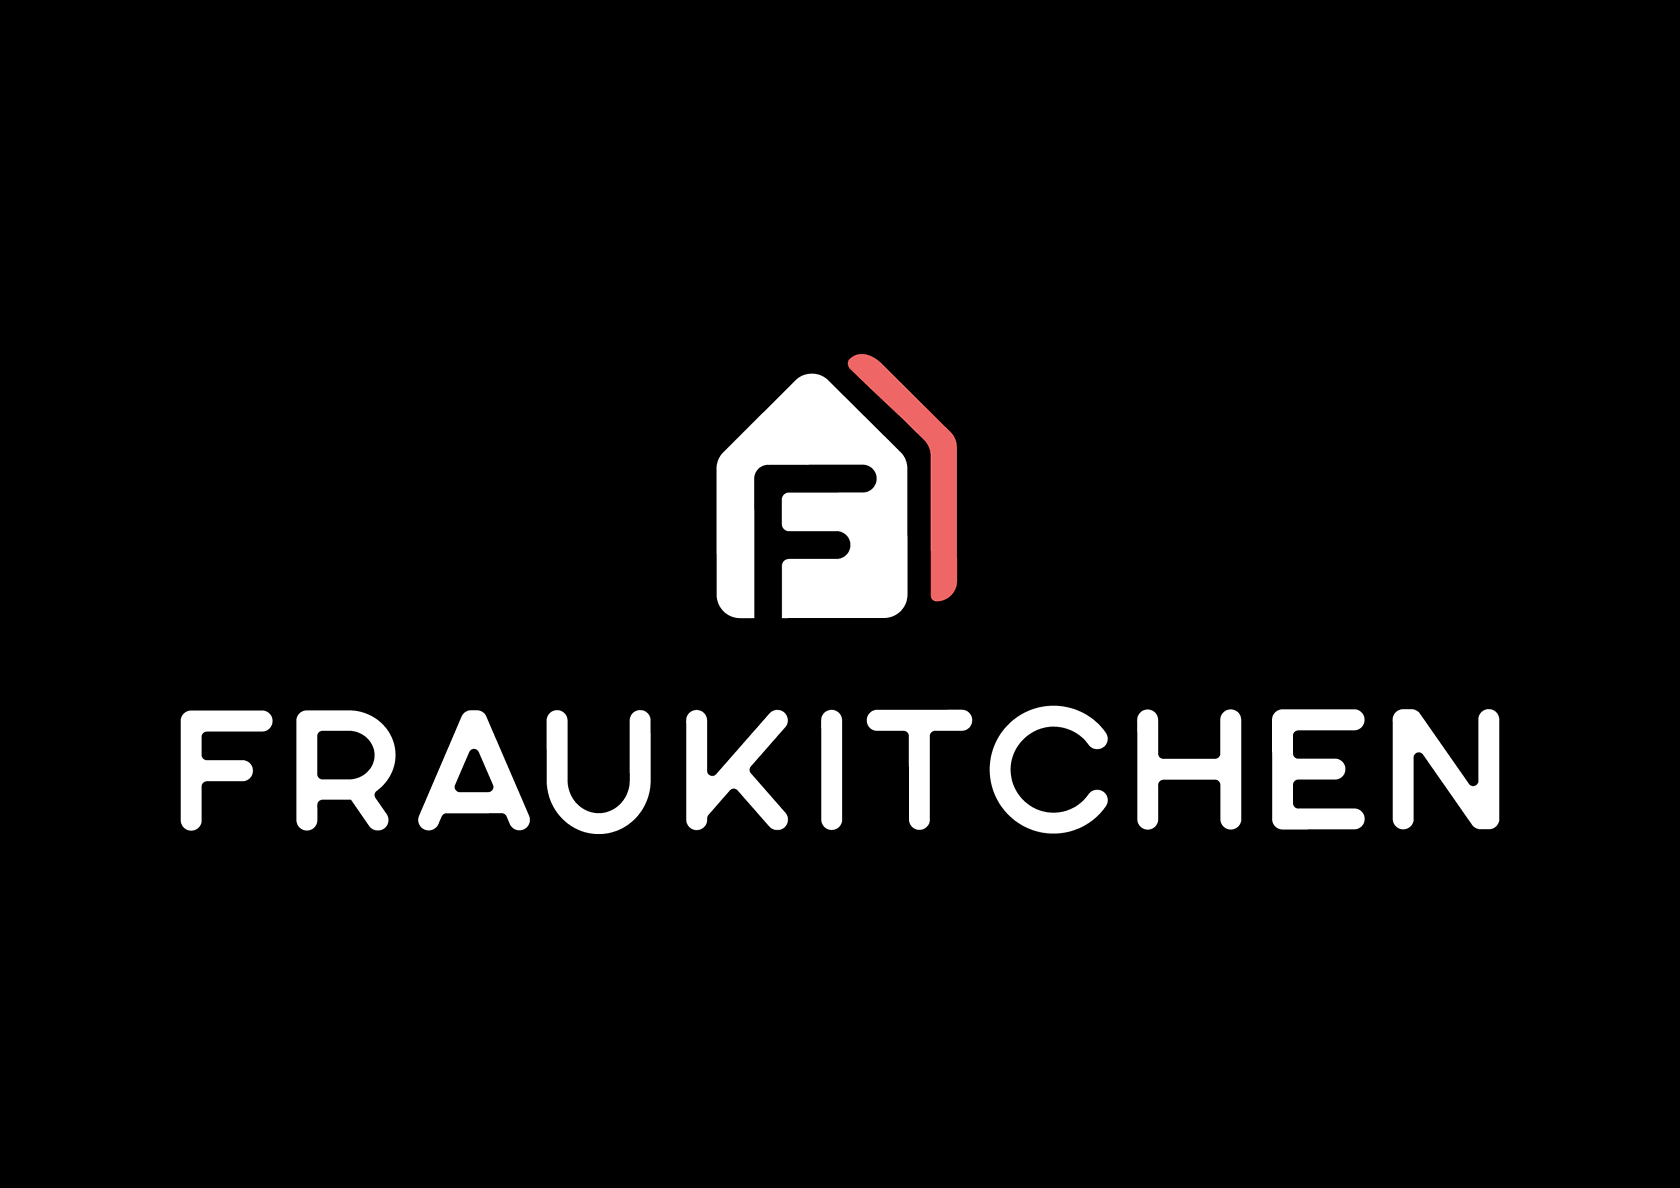 FRAU KITCHEN